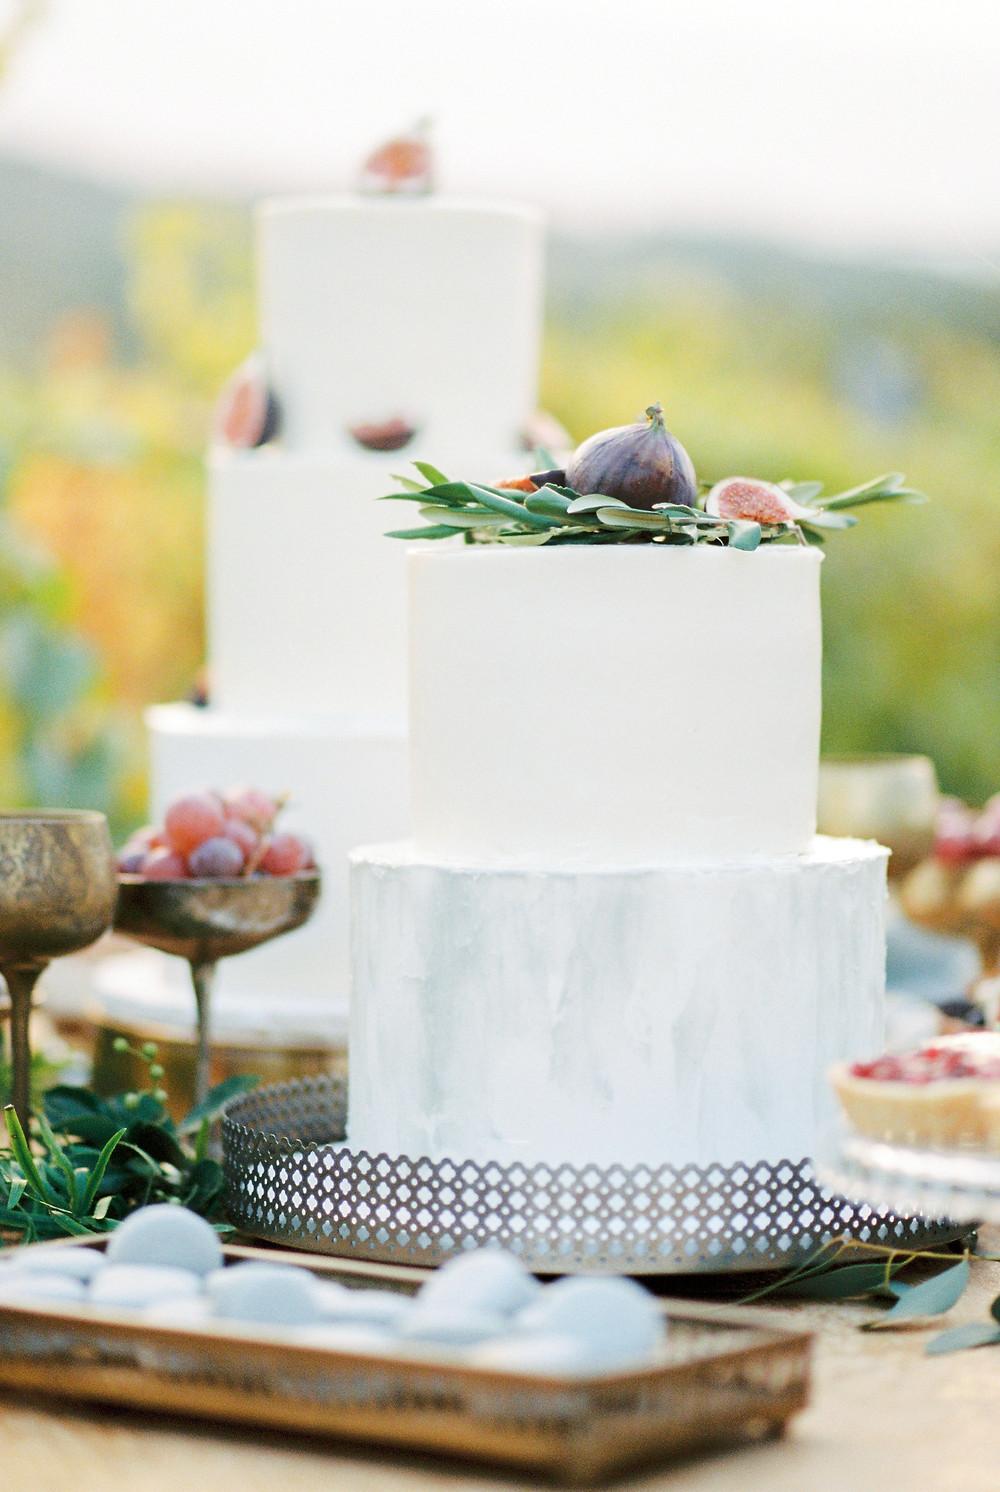 © Beloved esküvői fotó